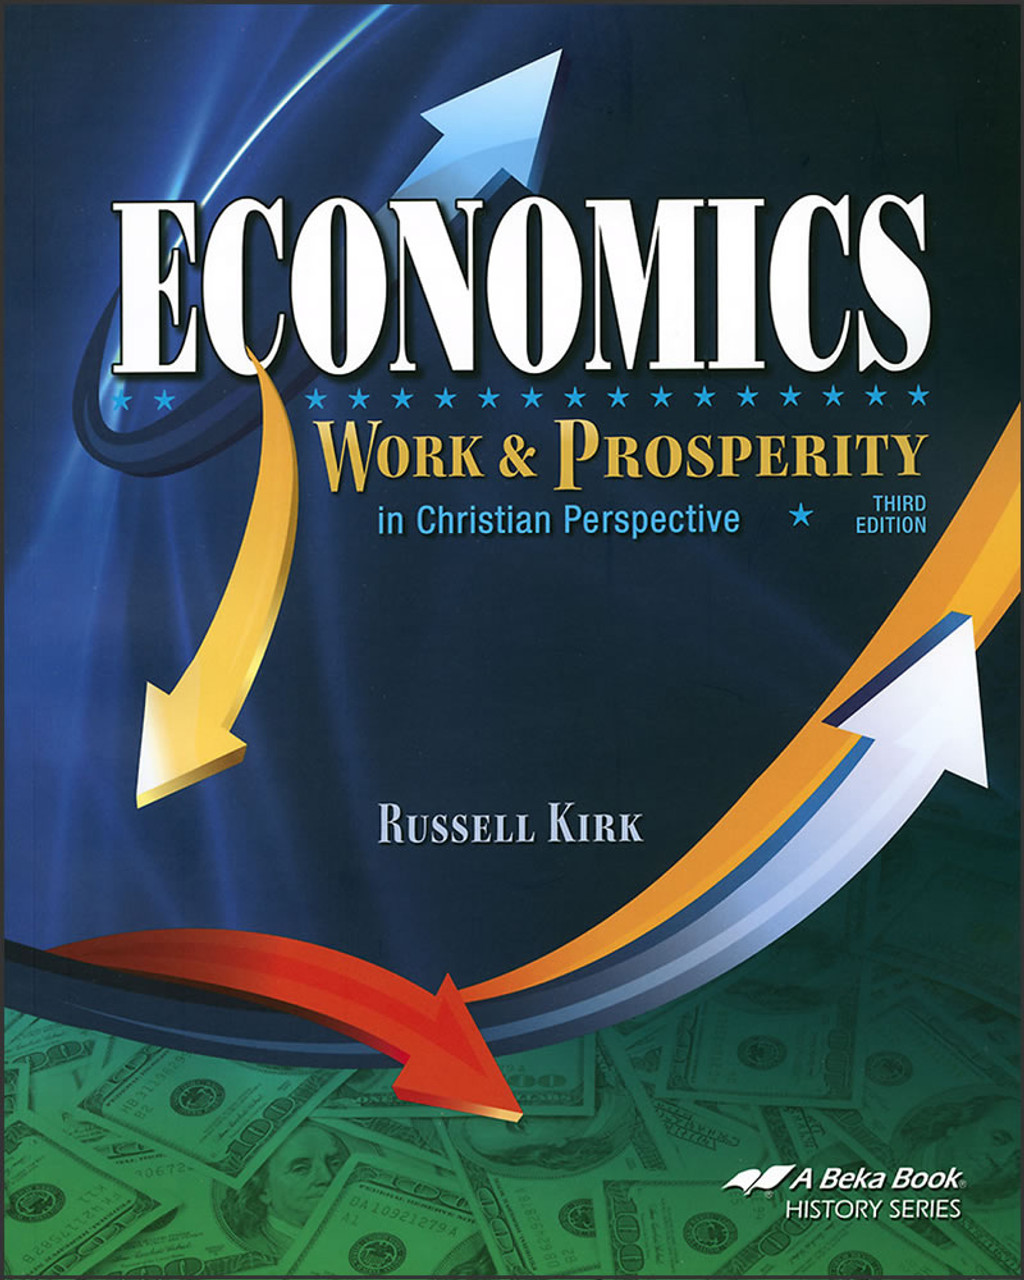 Economics: Work & Prosperity, 3rd edition